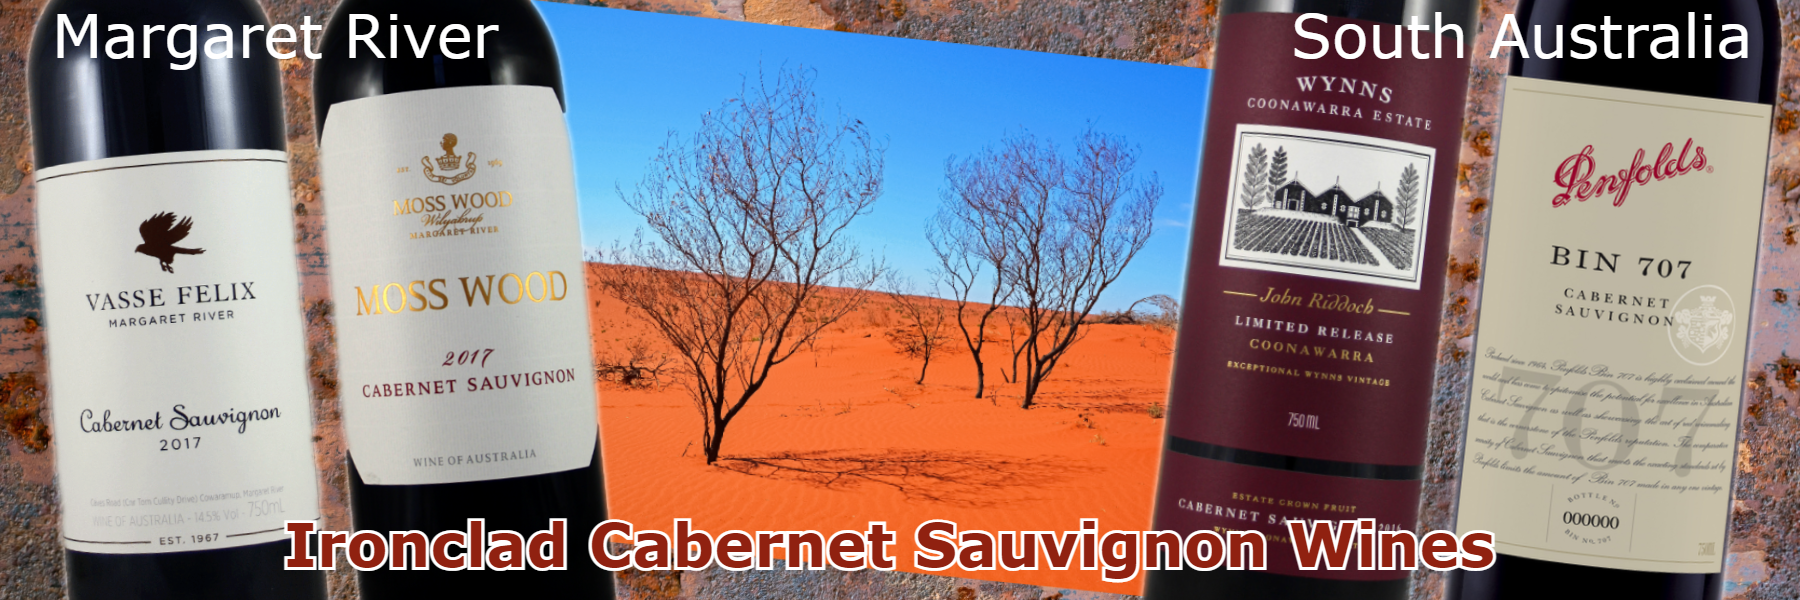 Ironclad Australian Cabernet Sauvignon & more from Oz